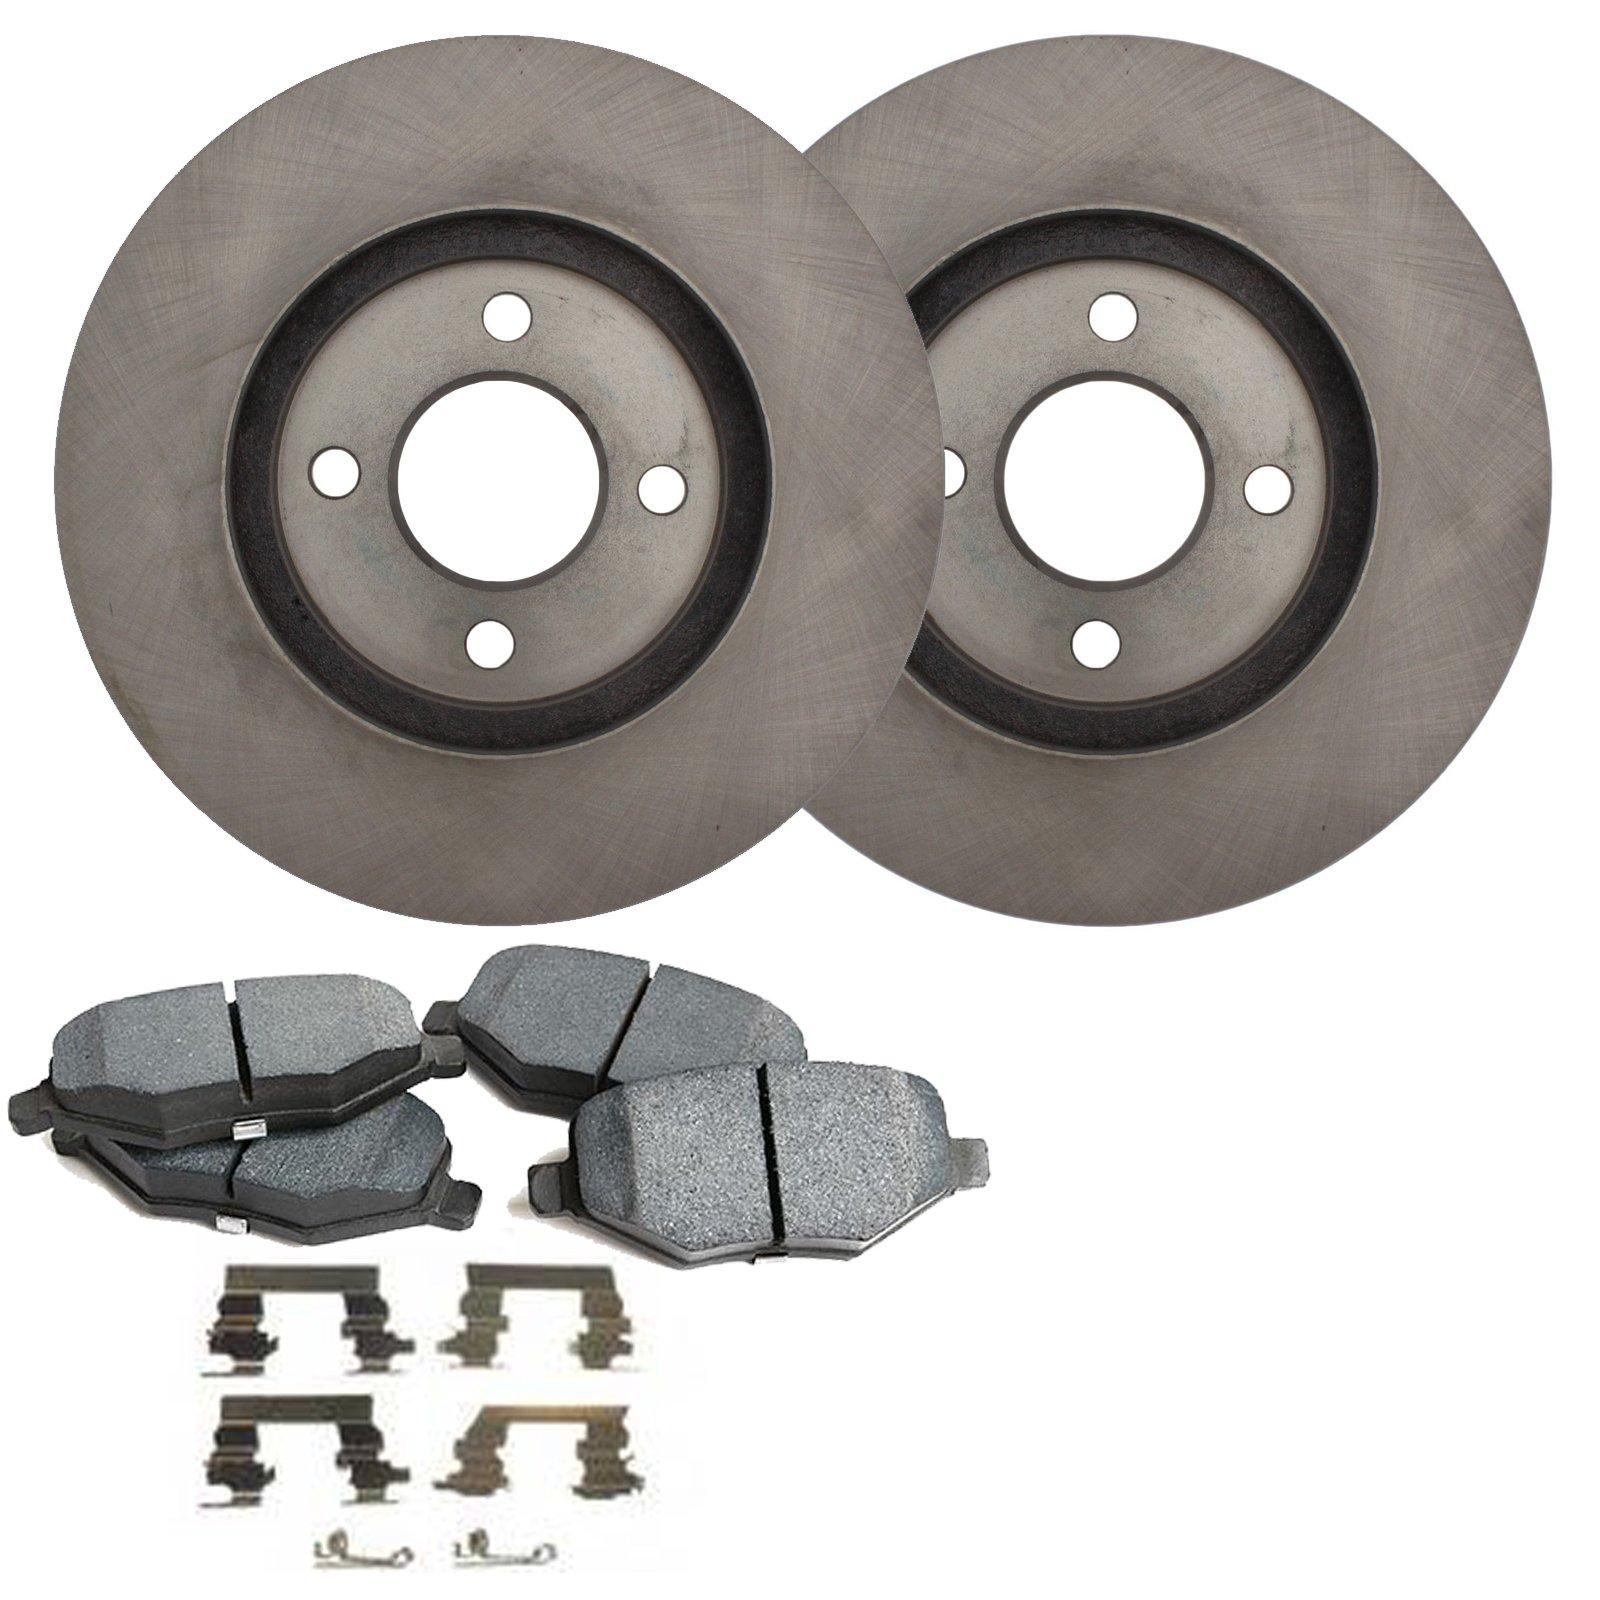 Detroit Axle - Front Disc Brake Rotors & Ceramic Pads w/Clips Hardware Kit Premium GRADE for 2008 2009 2010 2011 Ford Focus